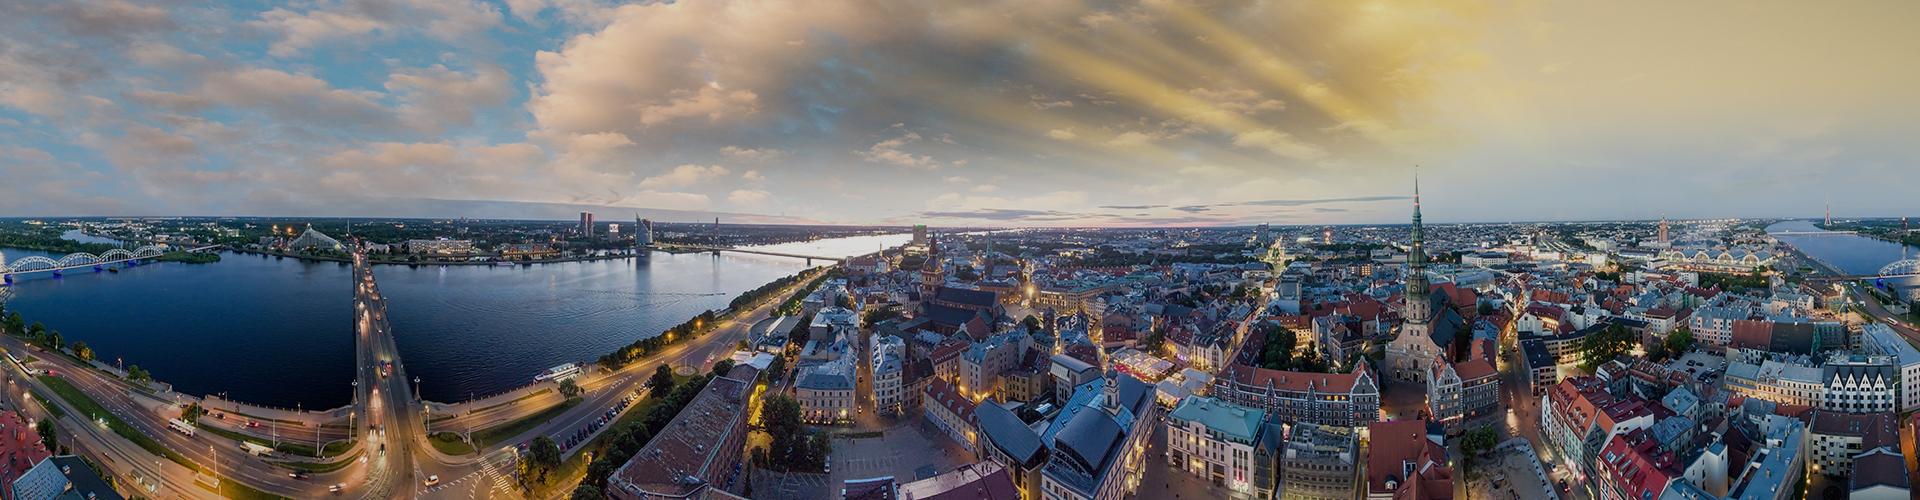 Landmark photograph of Latvia